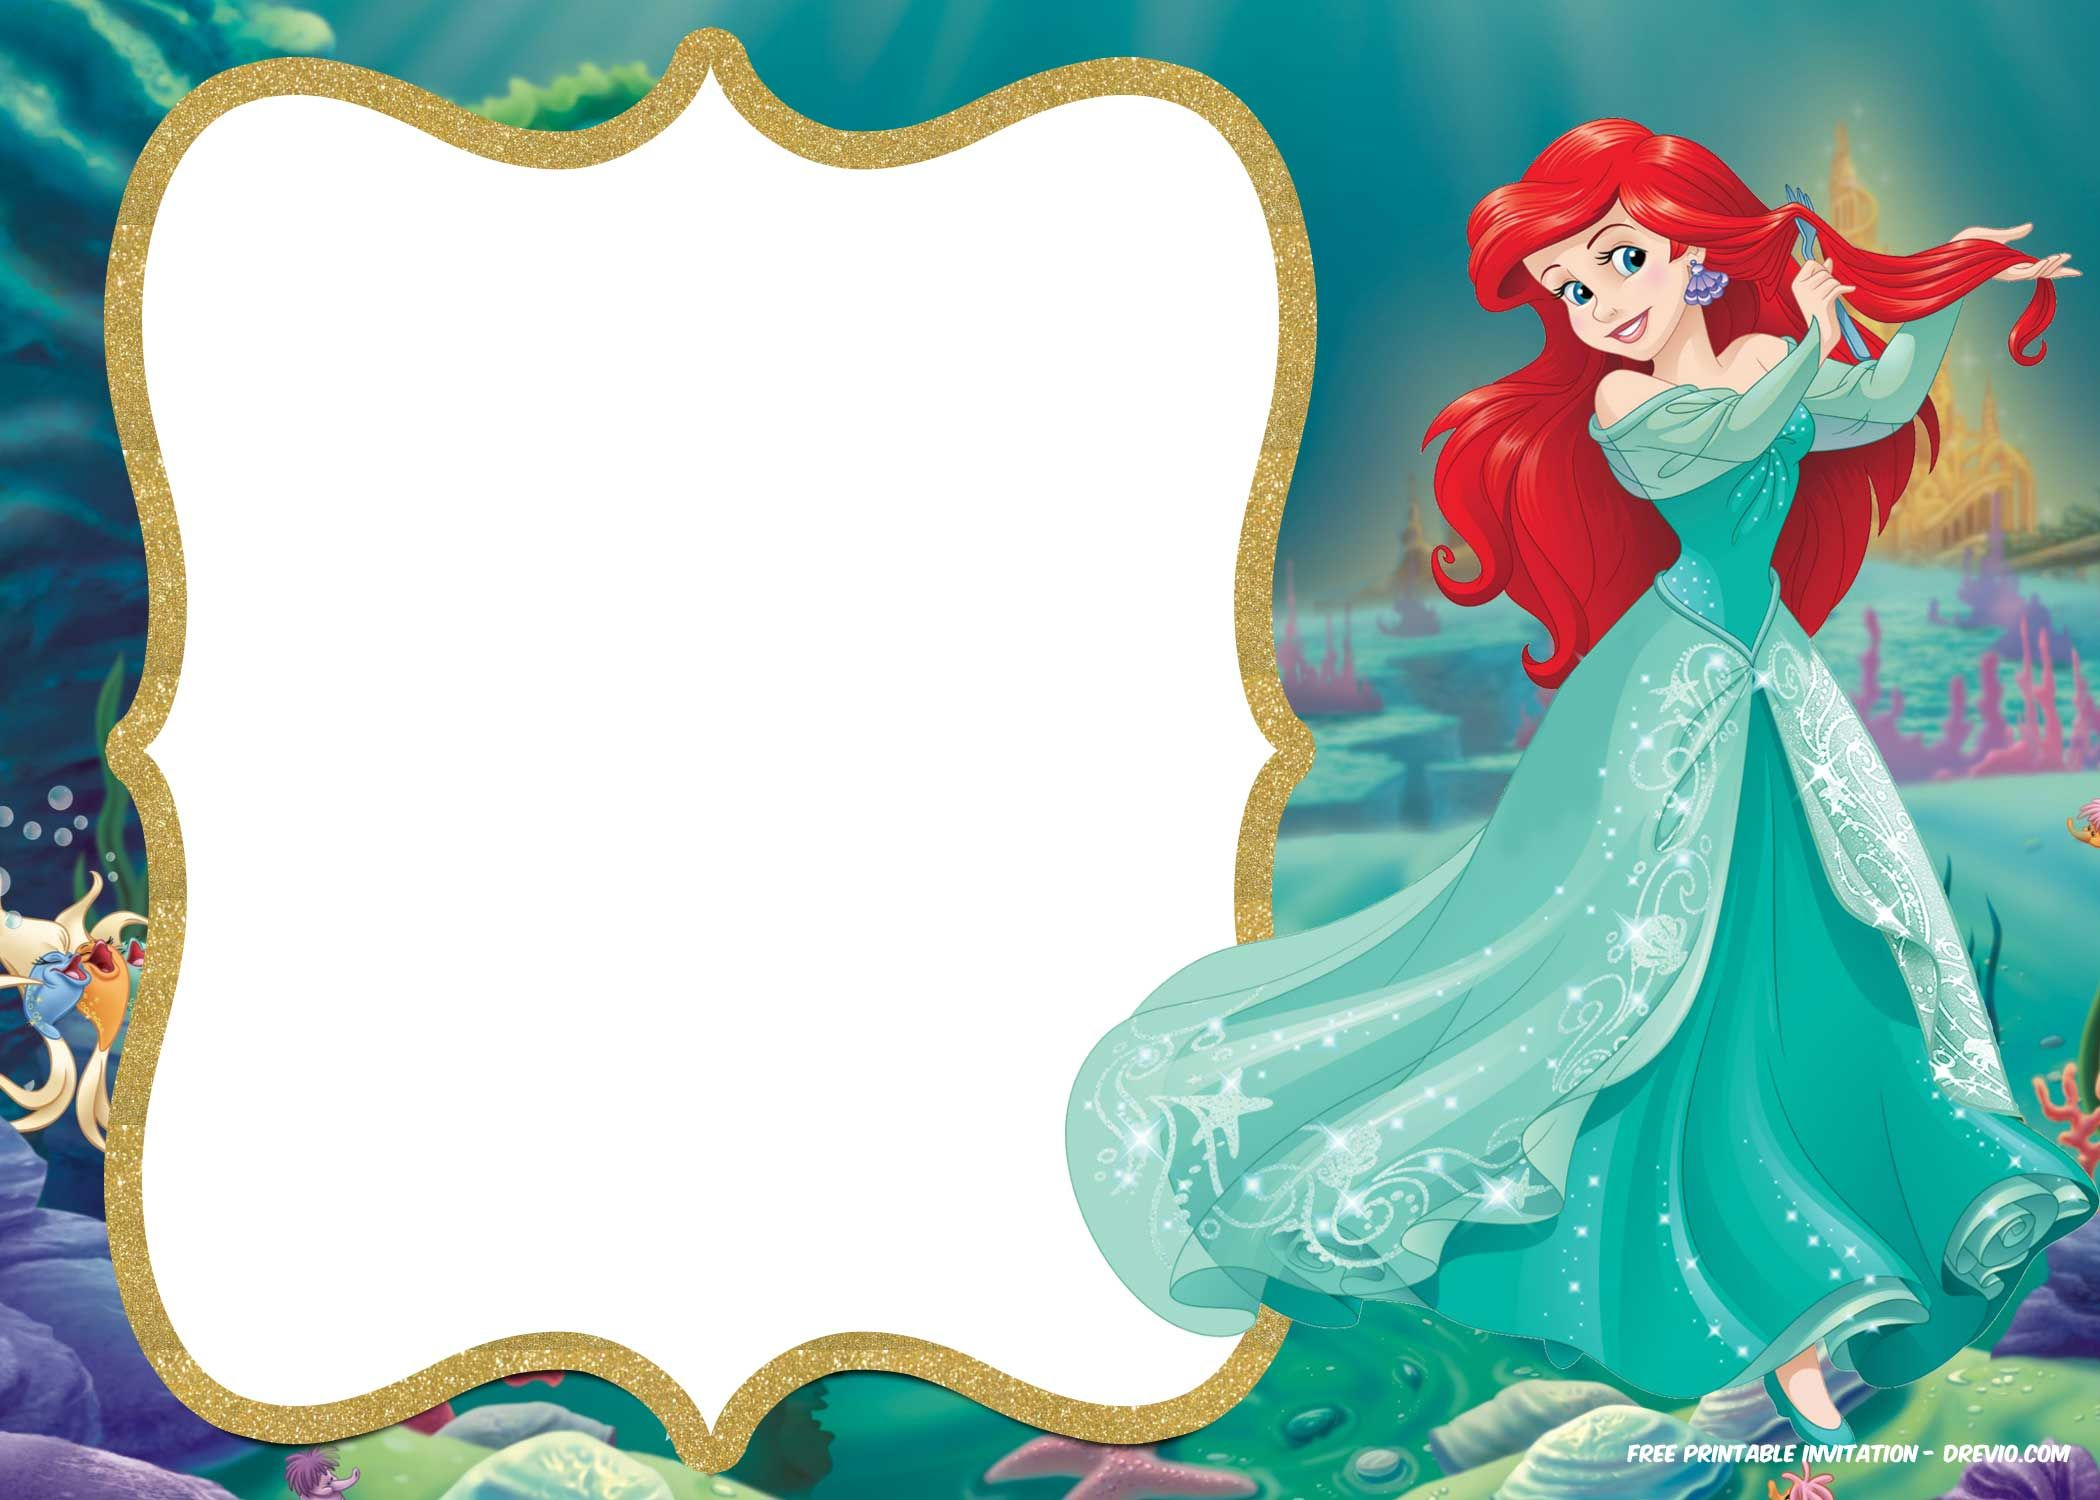 Little Mermaid Royal Invitation | Backgrounds | Little Mermaid - Free Little Mermaid Printable Invitations